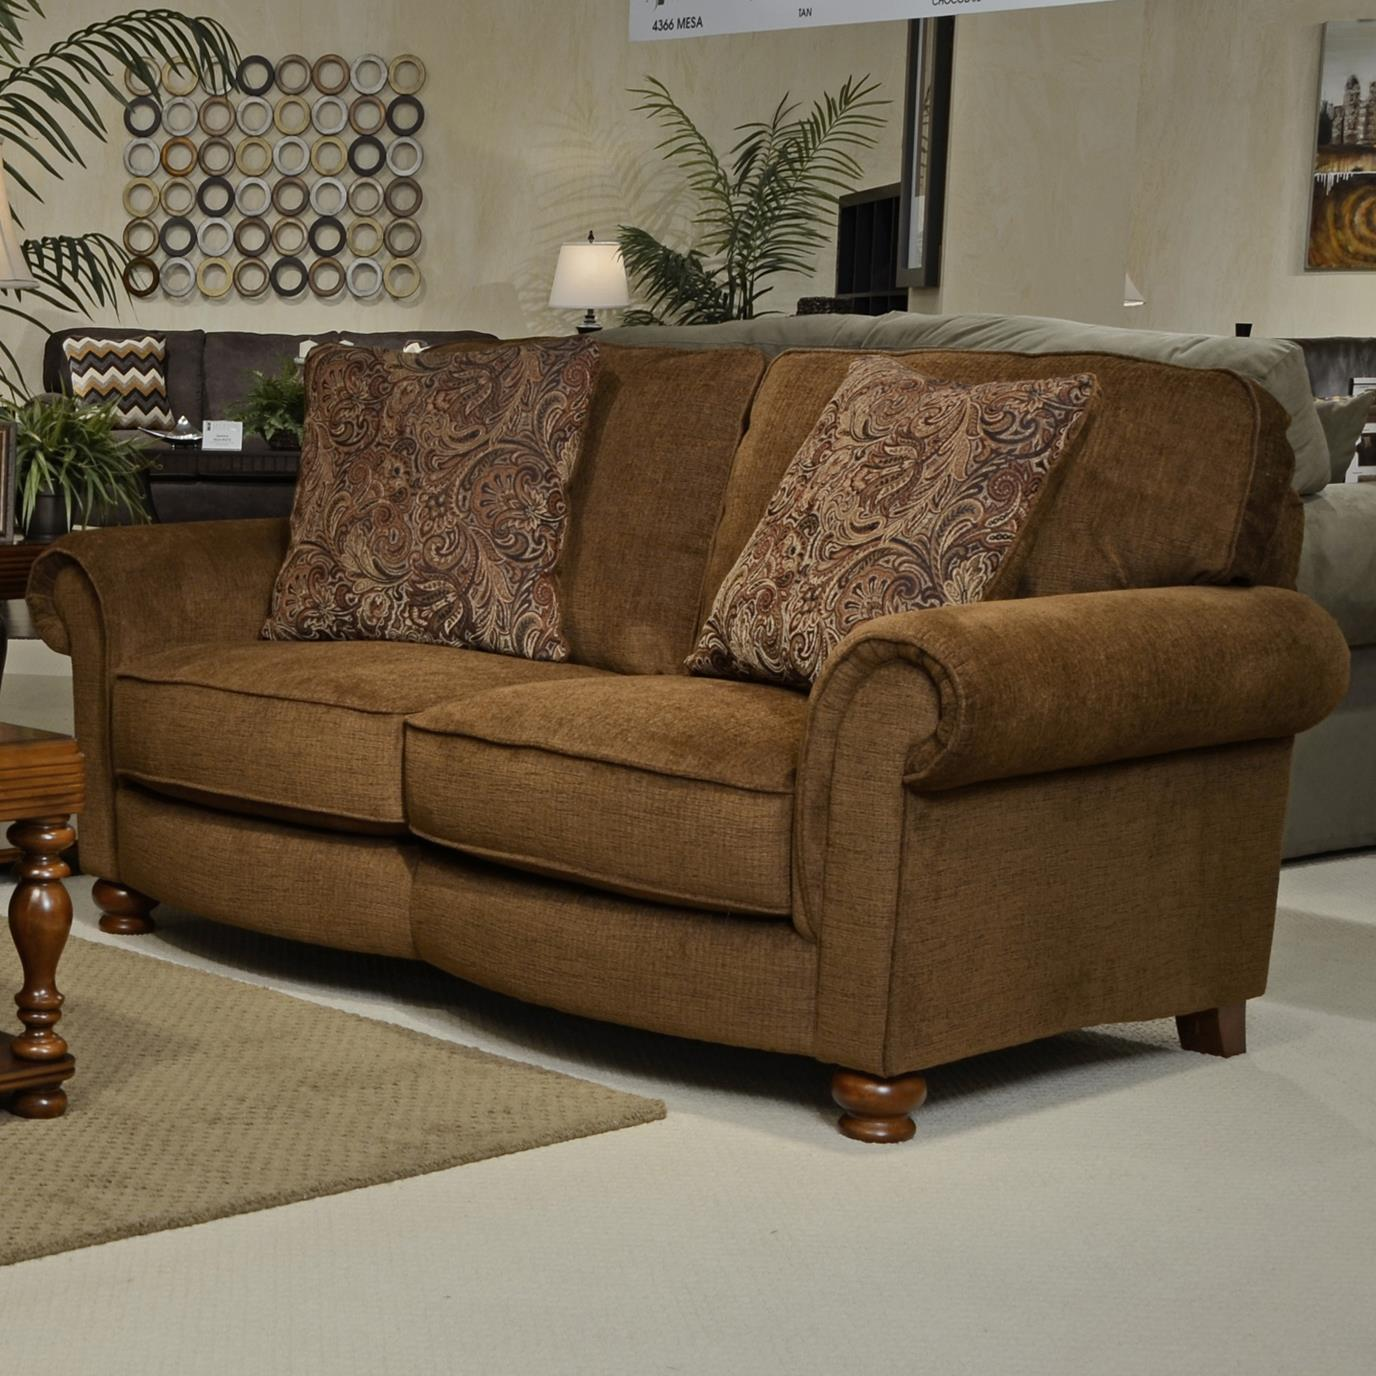 Jackson Furniture Sinclar Loveseat - Item Number: 4384-02-2906-59